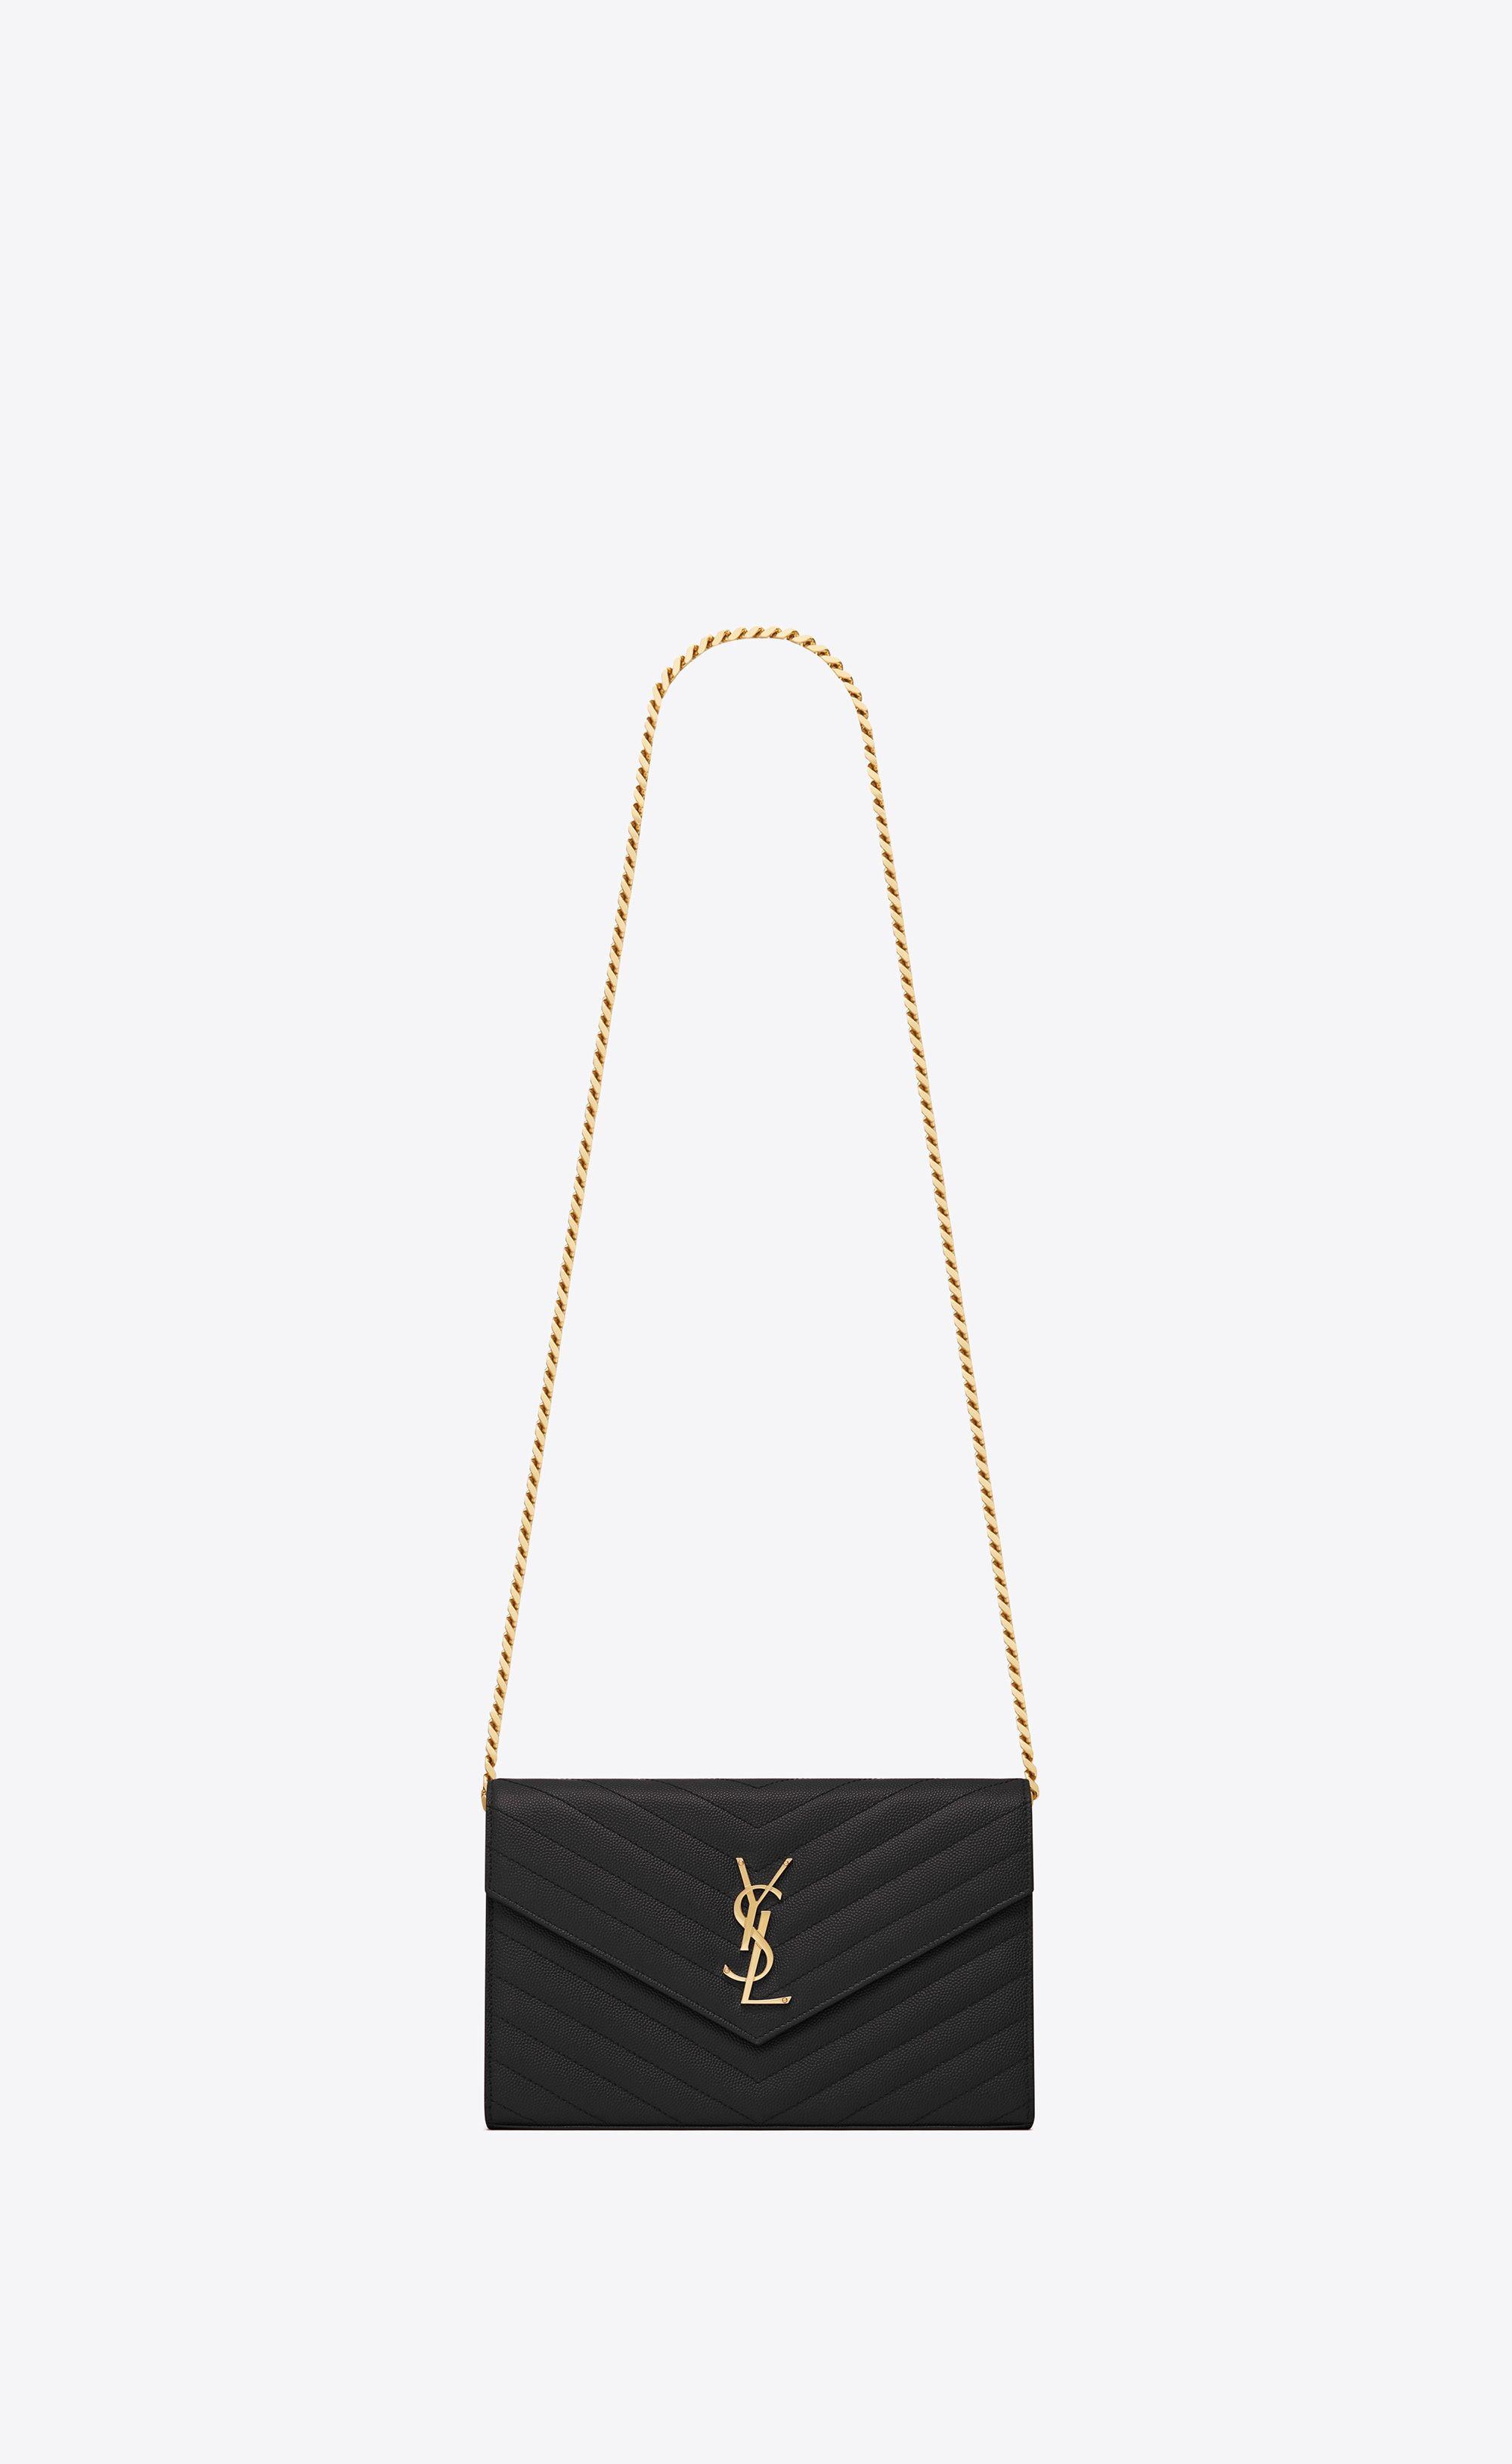 850762c4c9 SAINT LAURENT Mini bags Matelassé Woman MONOGRAM chain wallet in ...